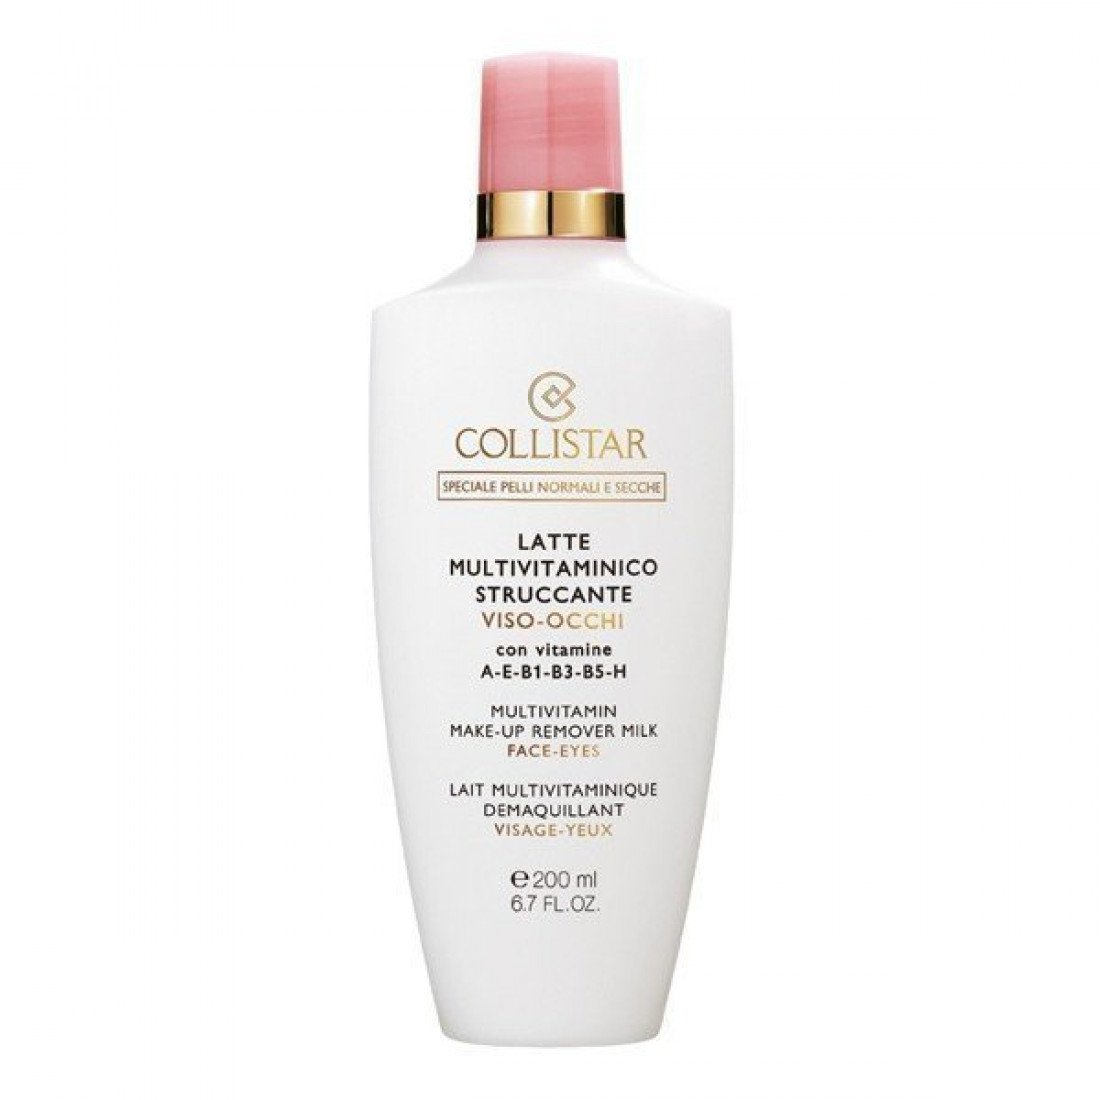 Collistar Multivitamin Make-up Remover Milk 200 ml